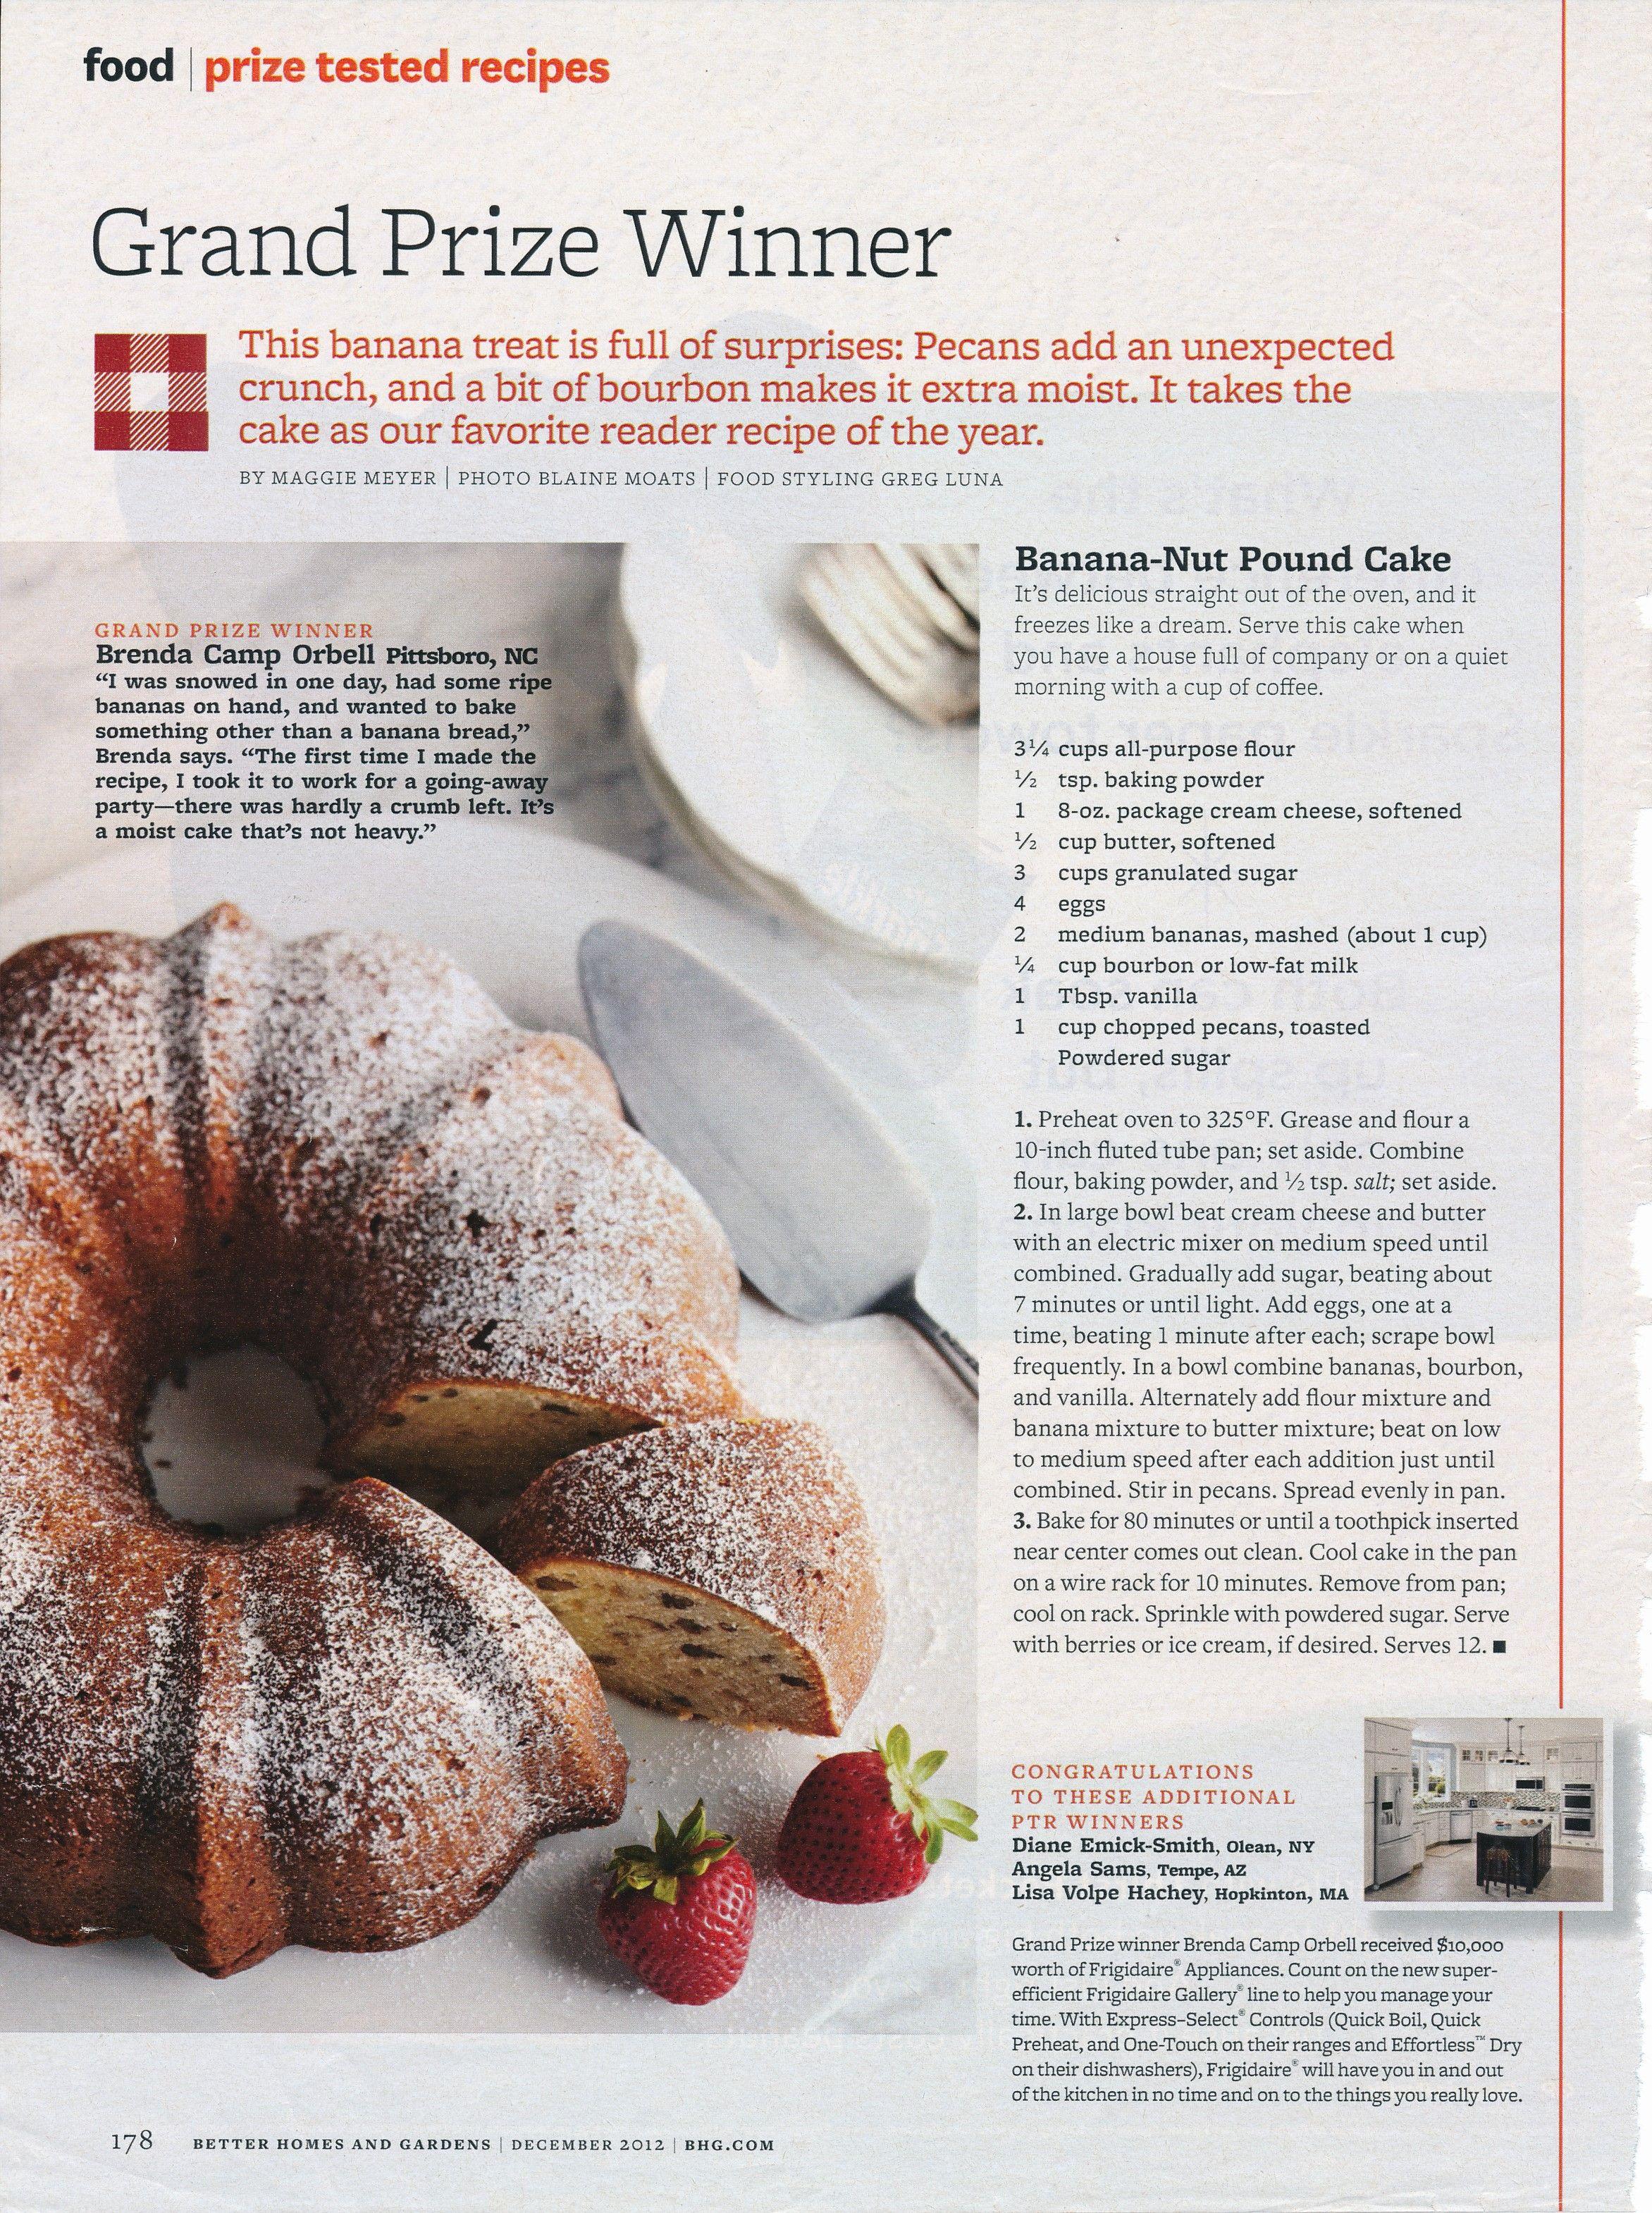 4041f6e26fd8c60cd3a96bf7cb8cd166 - Better Homes And Gardens New Cookbook Banana Bread Recipe